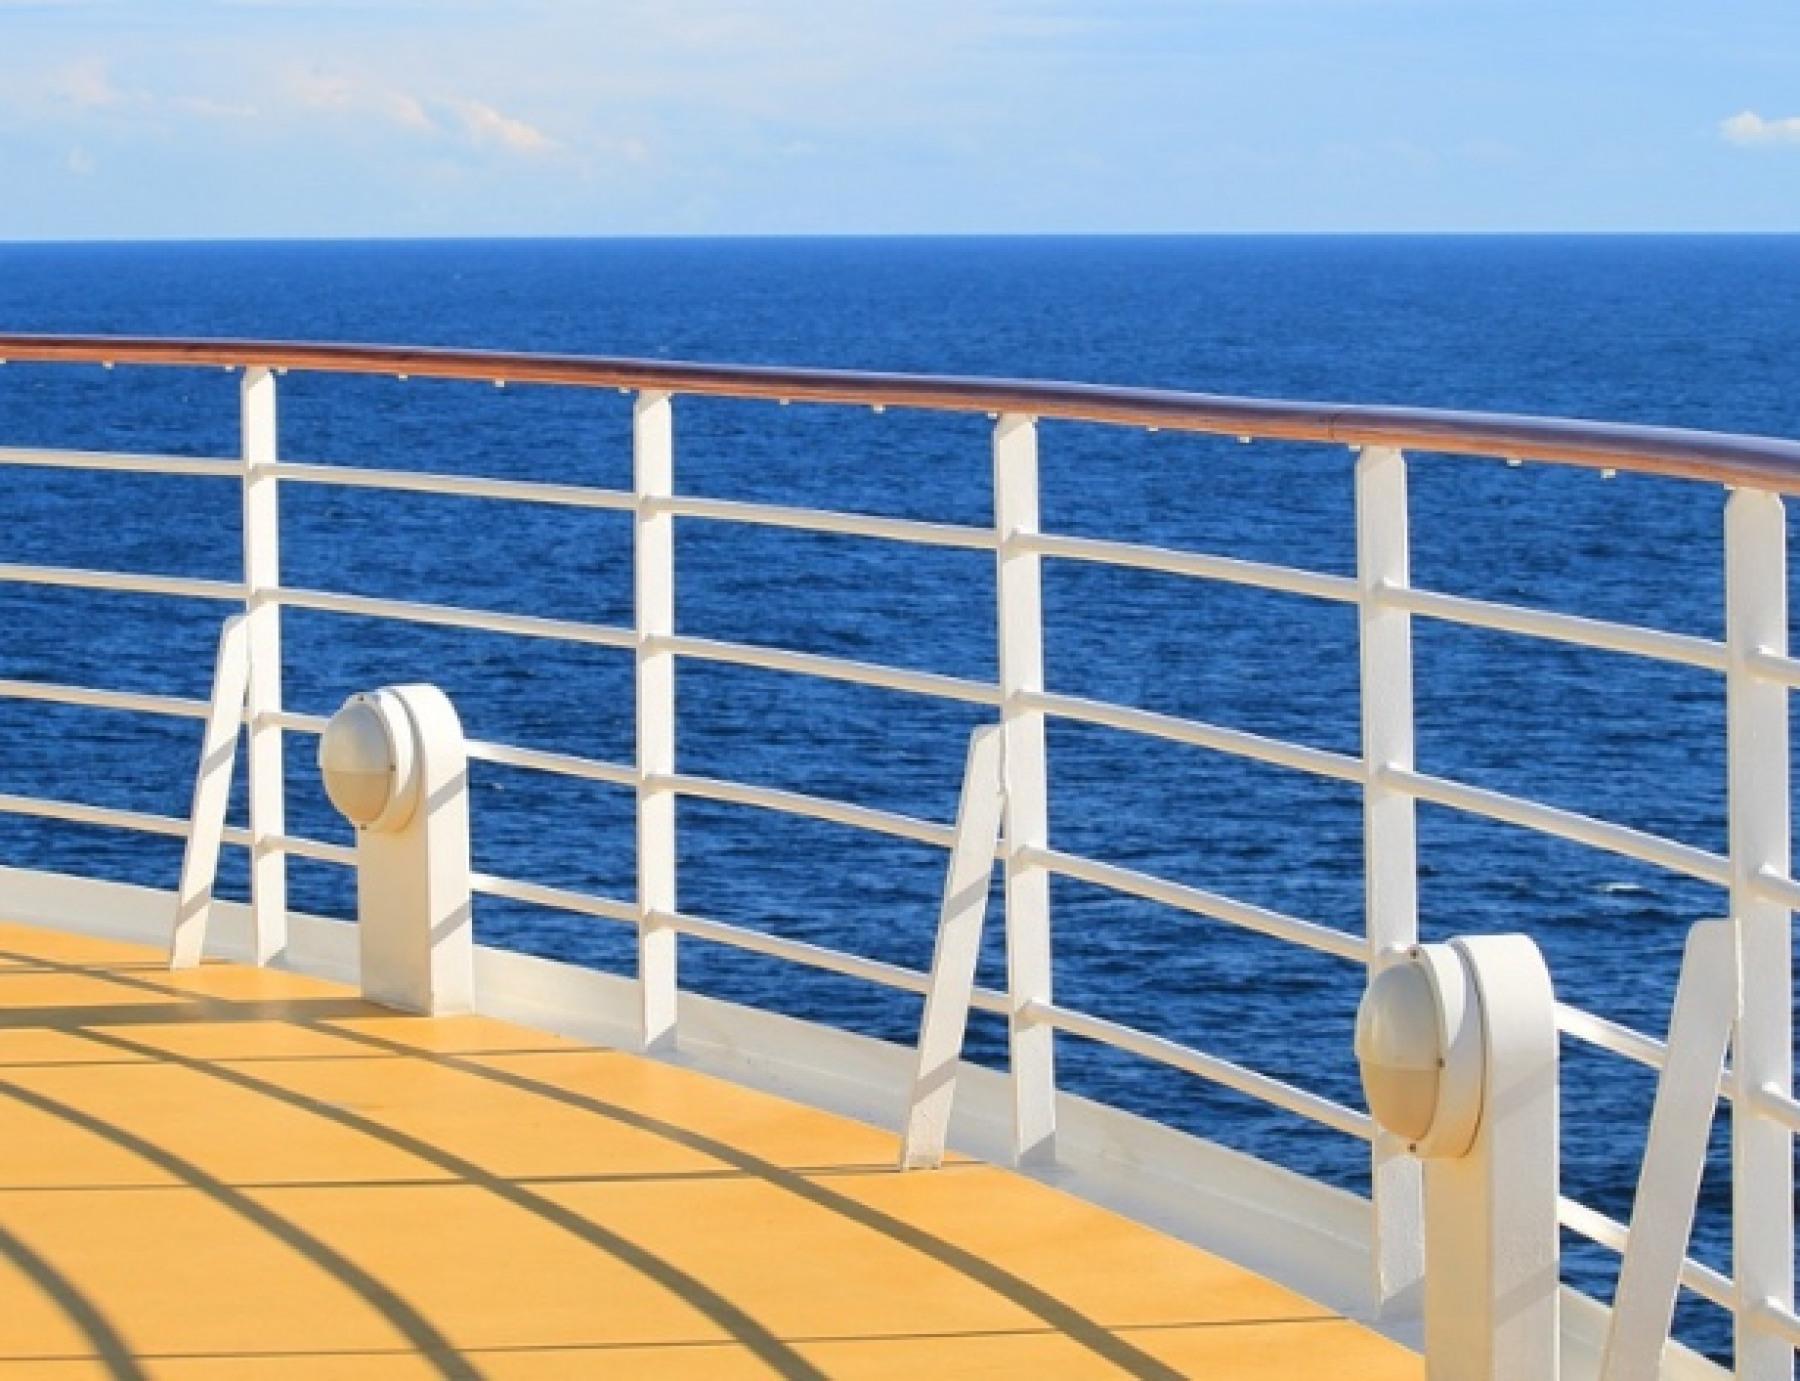 Norwegian Cruise Line Norwegian Jewel Accommodation Porthole Window.jpg